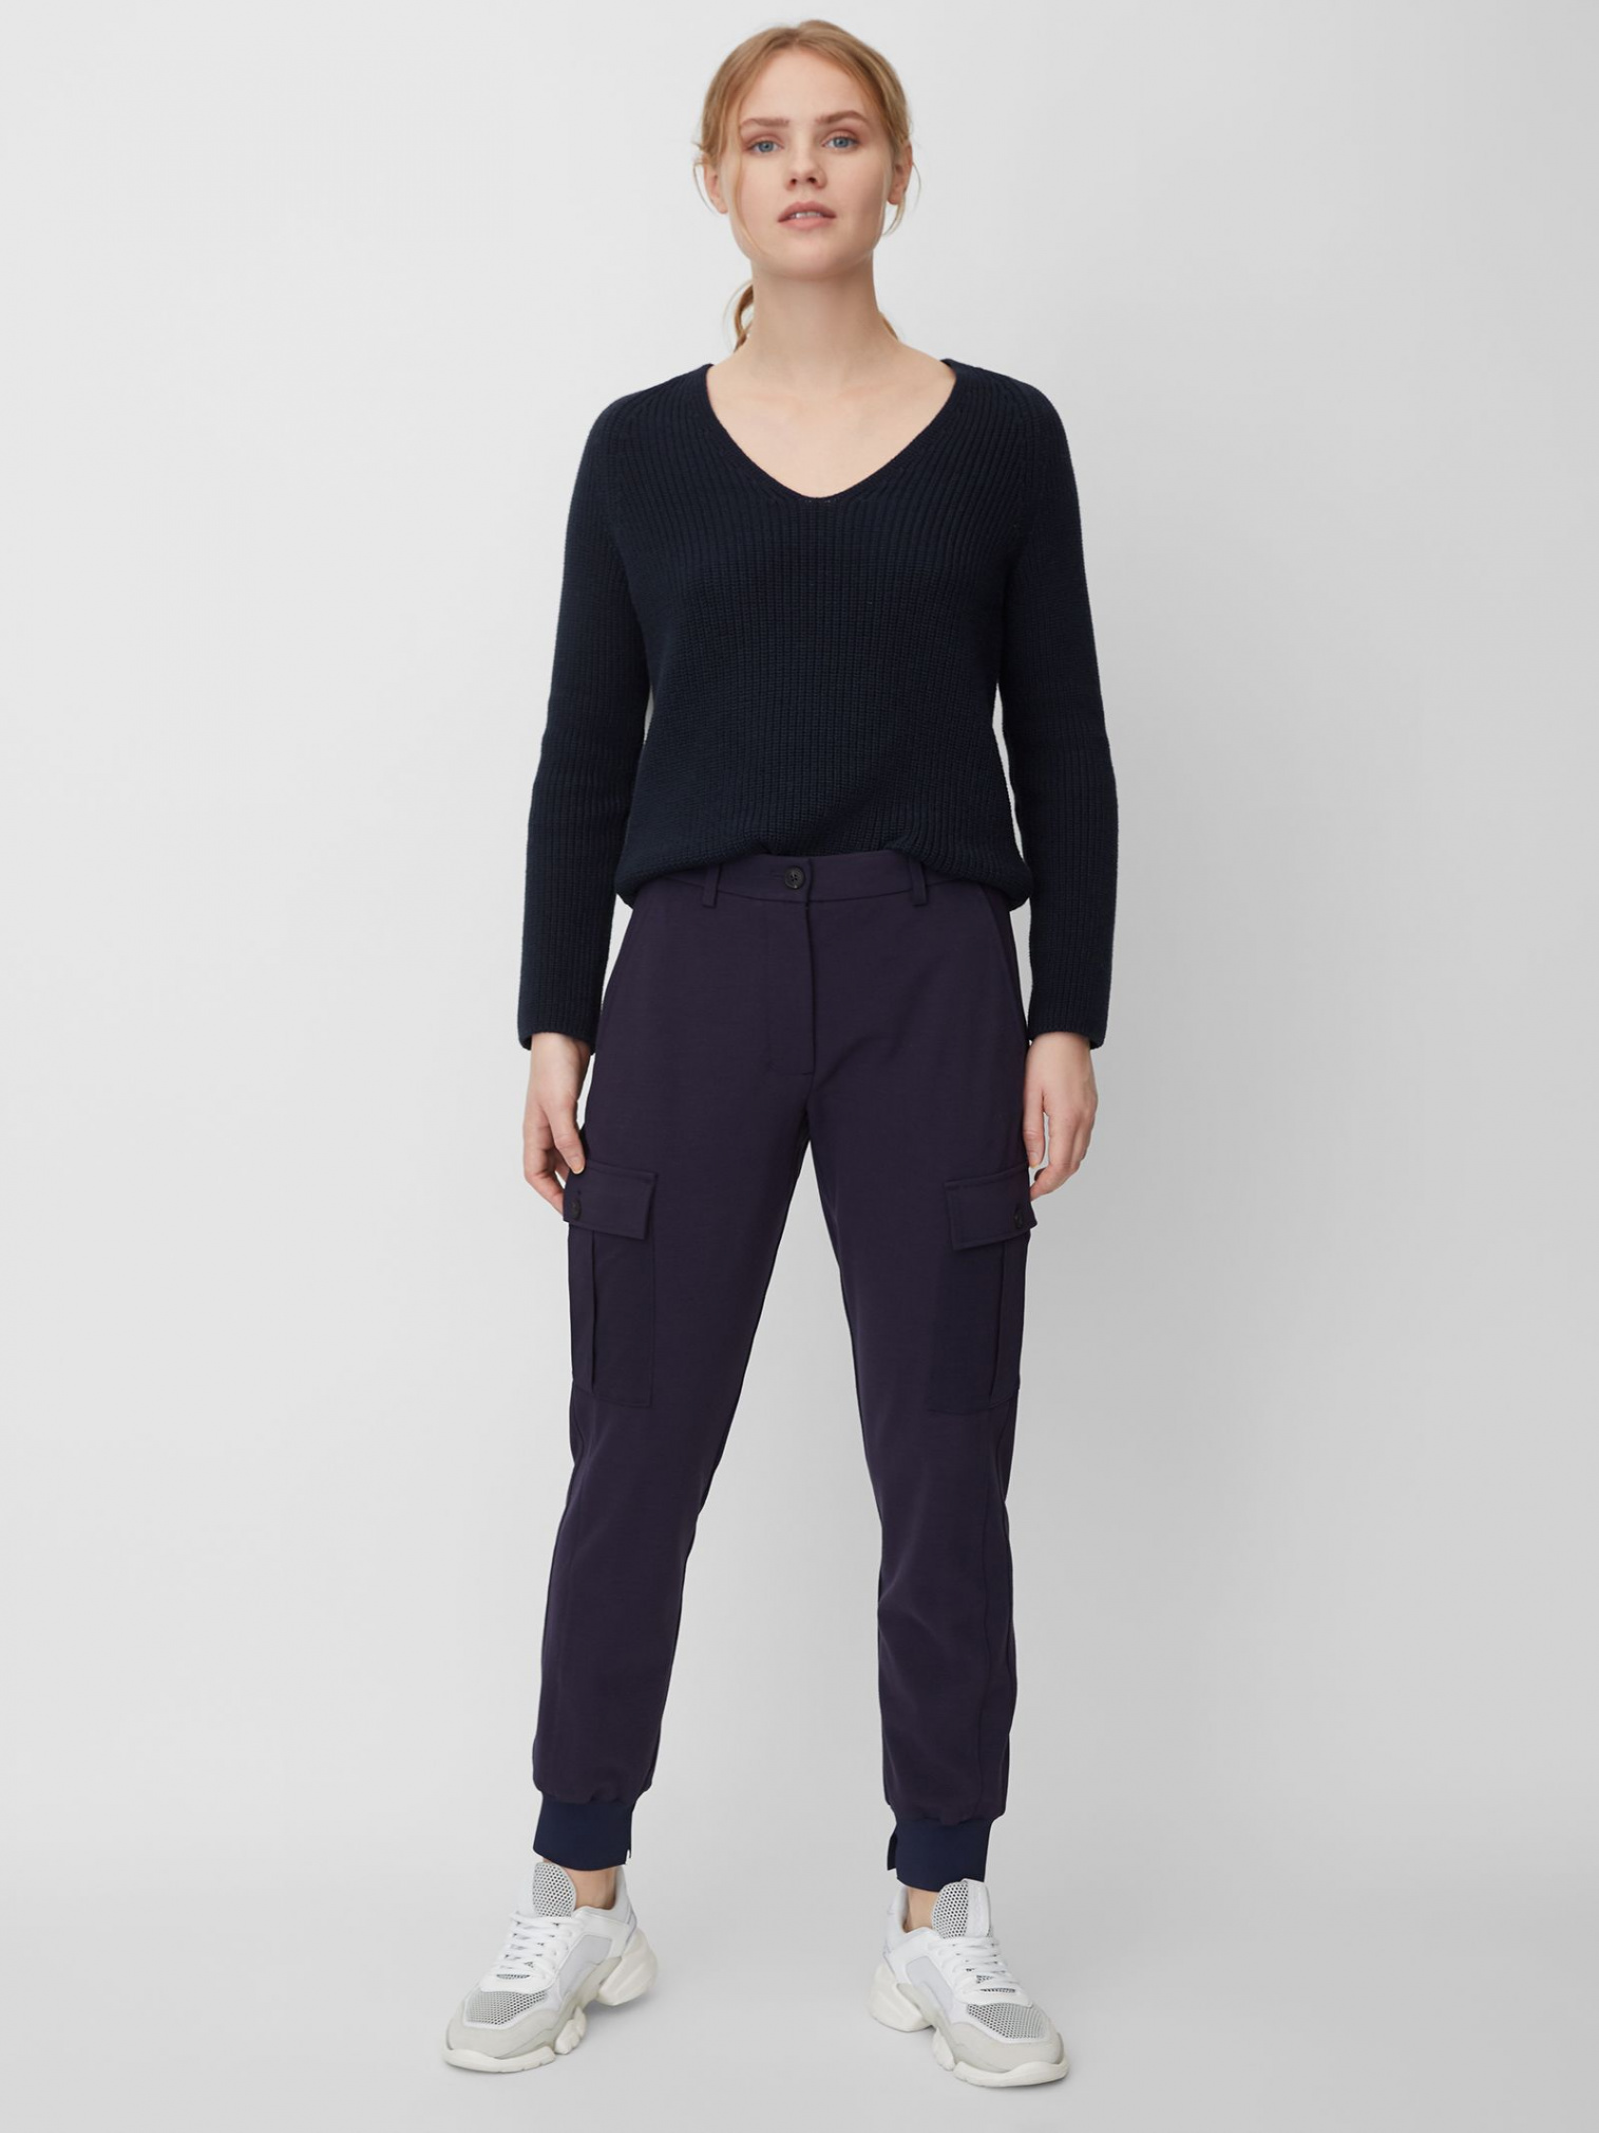 Кофты и свитера женские MARC O'POLO модель PF3980 приобрести, 2017